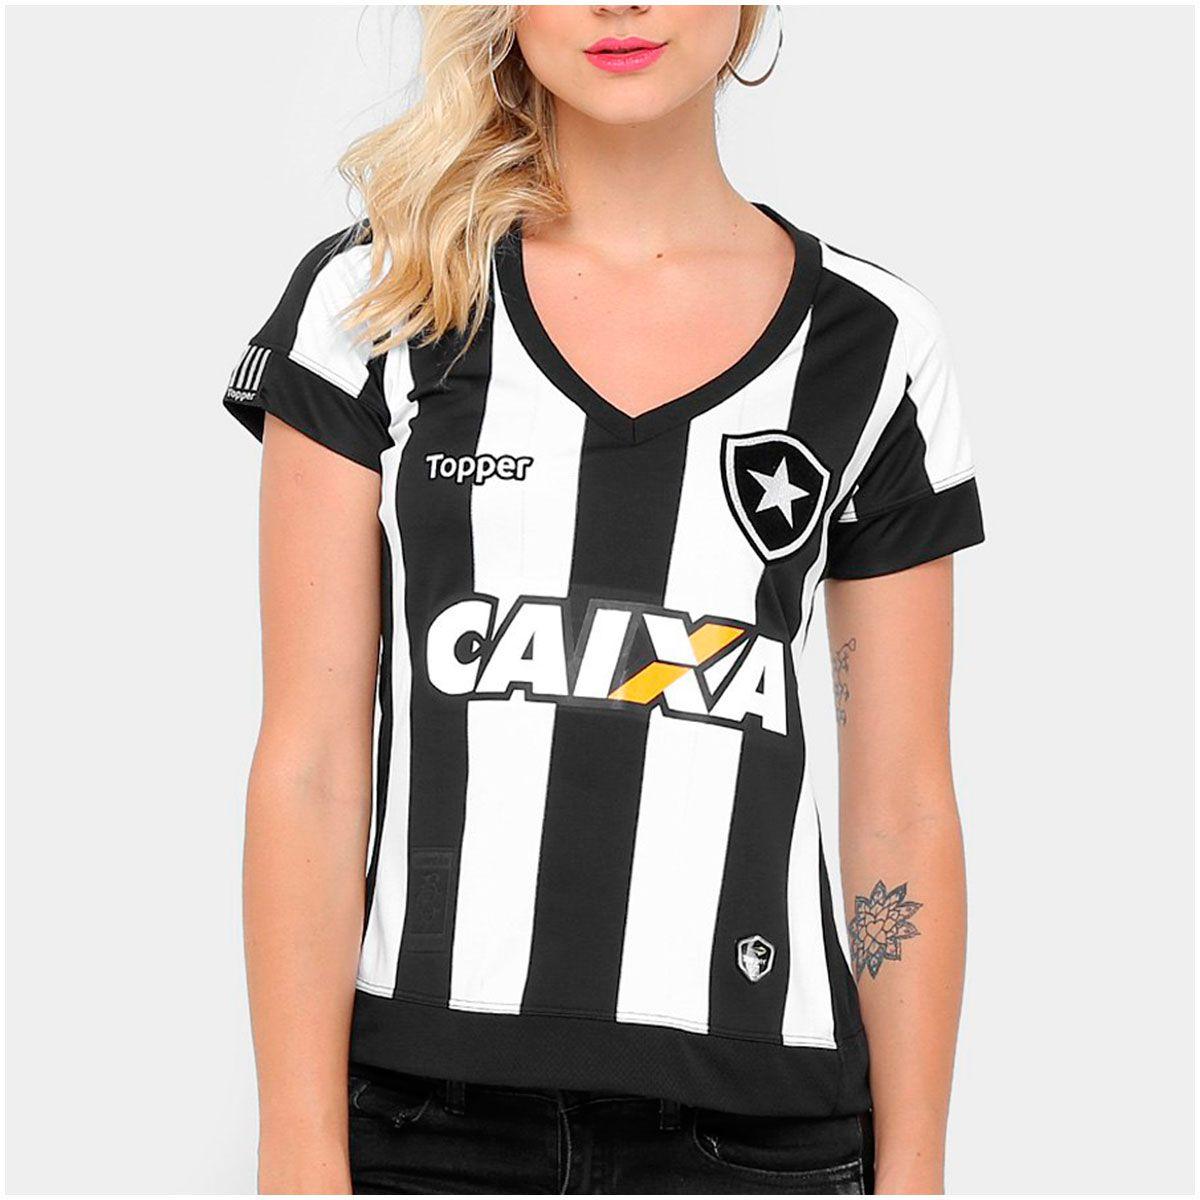 d38b90ba2d Camisa Botafogo I Topeer 2017 18 Feminina - Futebol Cia - Paixao por  Futebol !